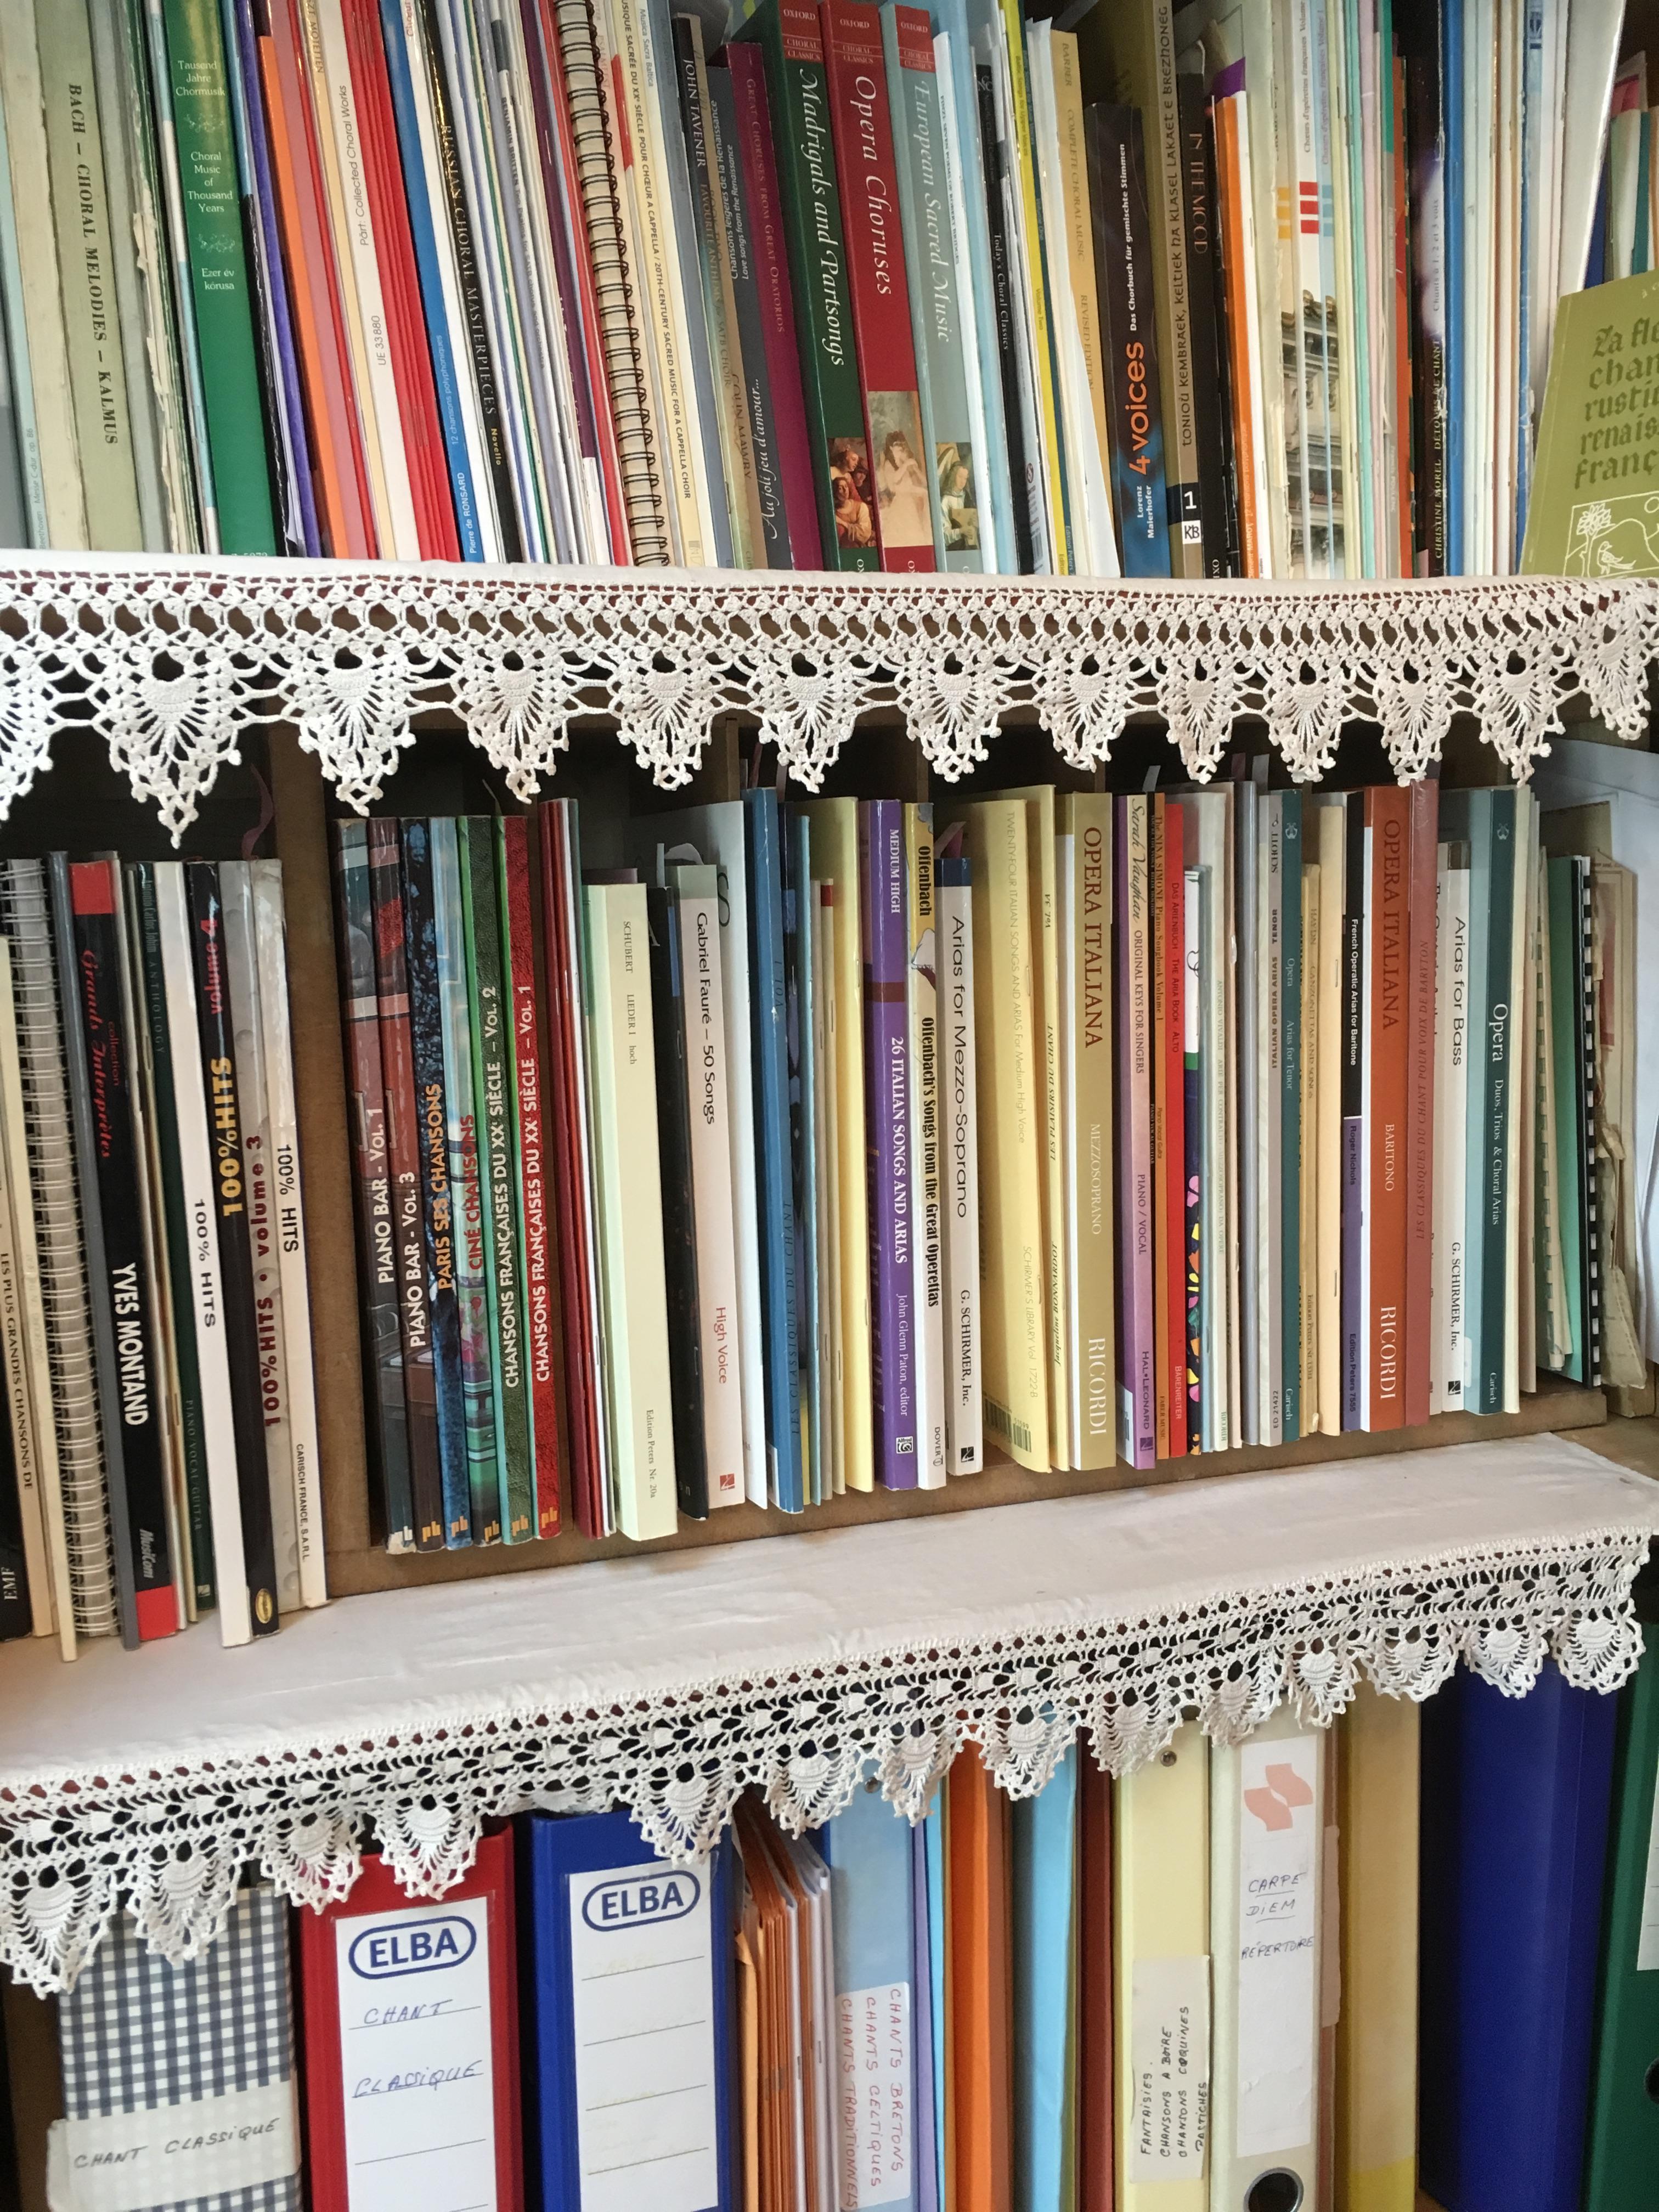 Biblotheque musicale : opera, chant et choeur